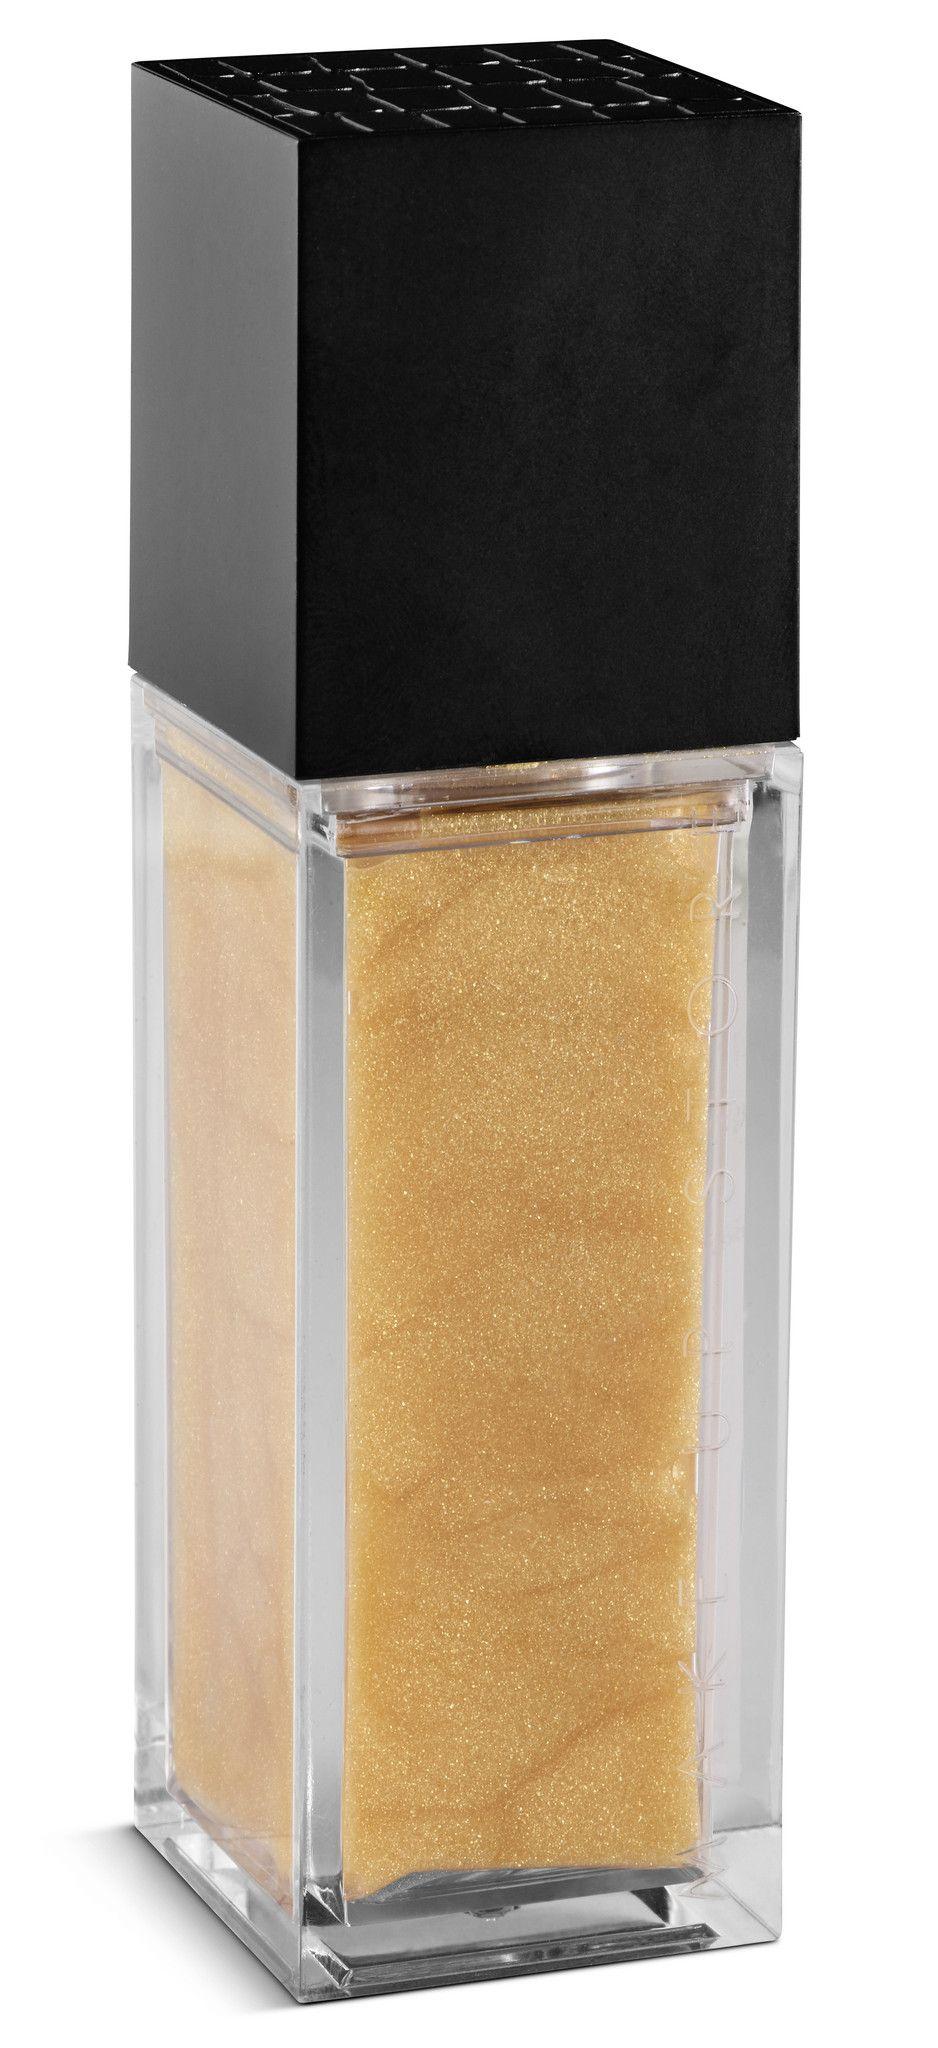 Midnight Glow Pearl Glow, Liquid highlighter, Beauty items